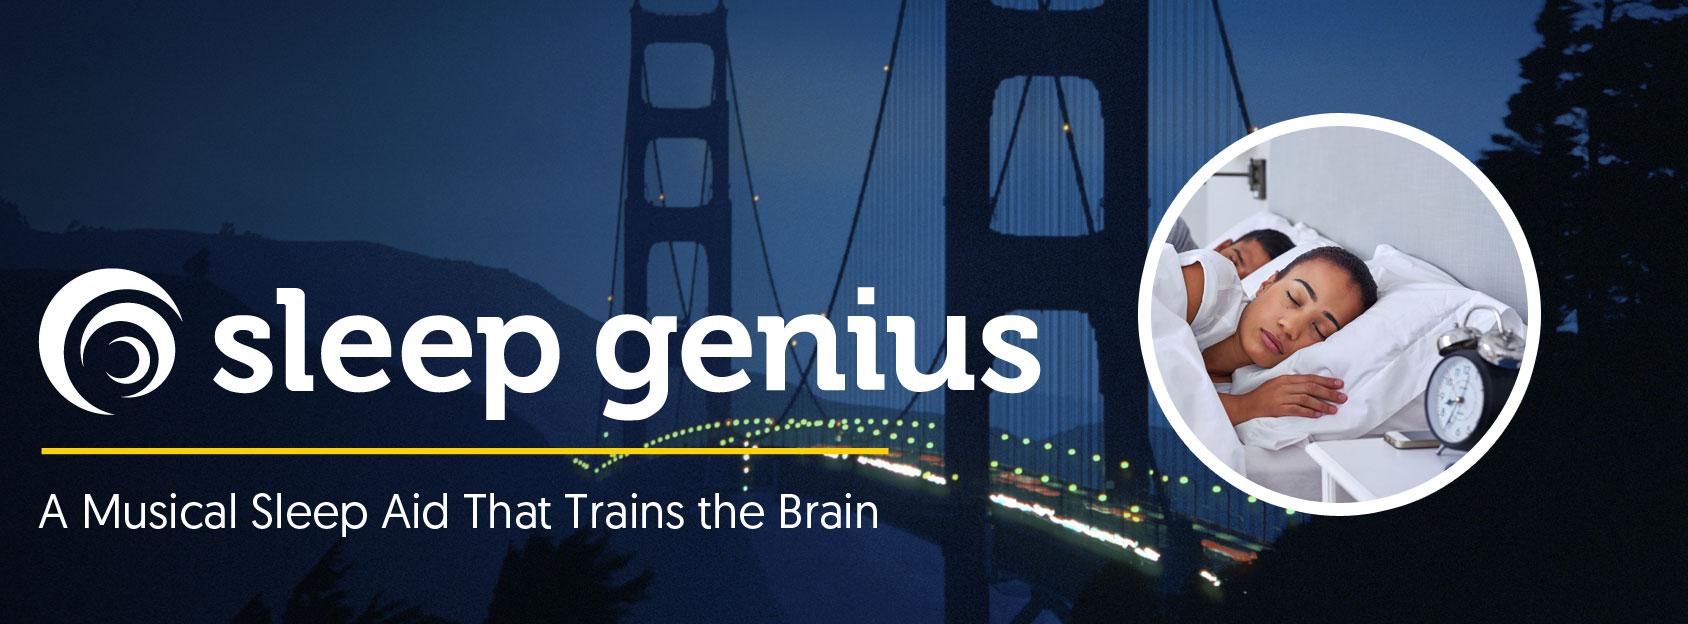 sleep-genius-musical-sleepaid-trains-brain-jpg